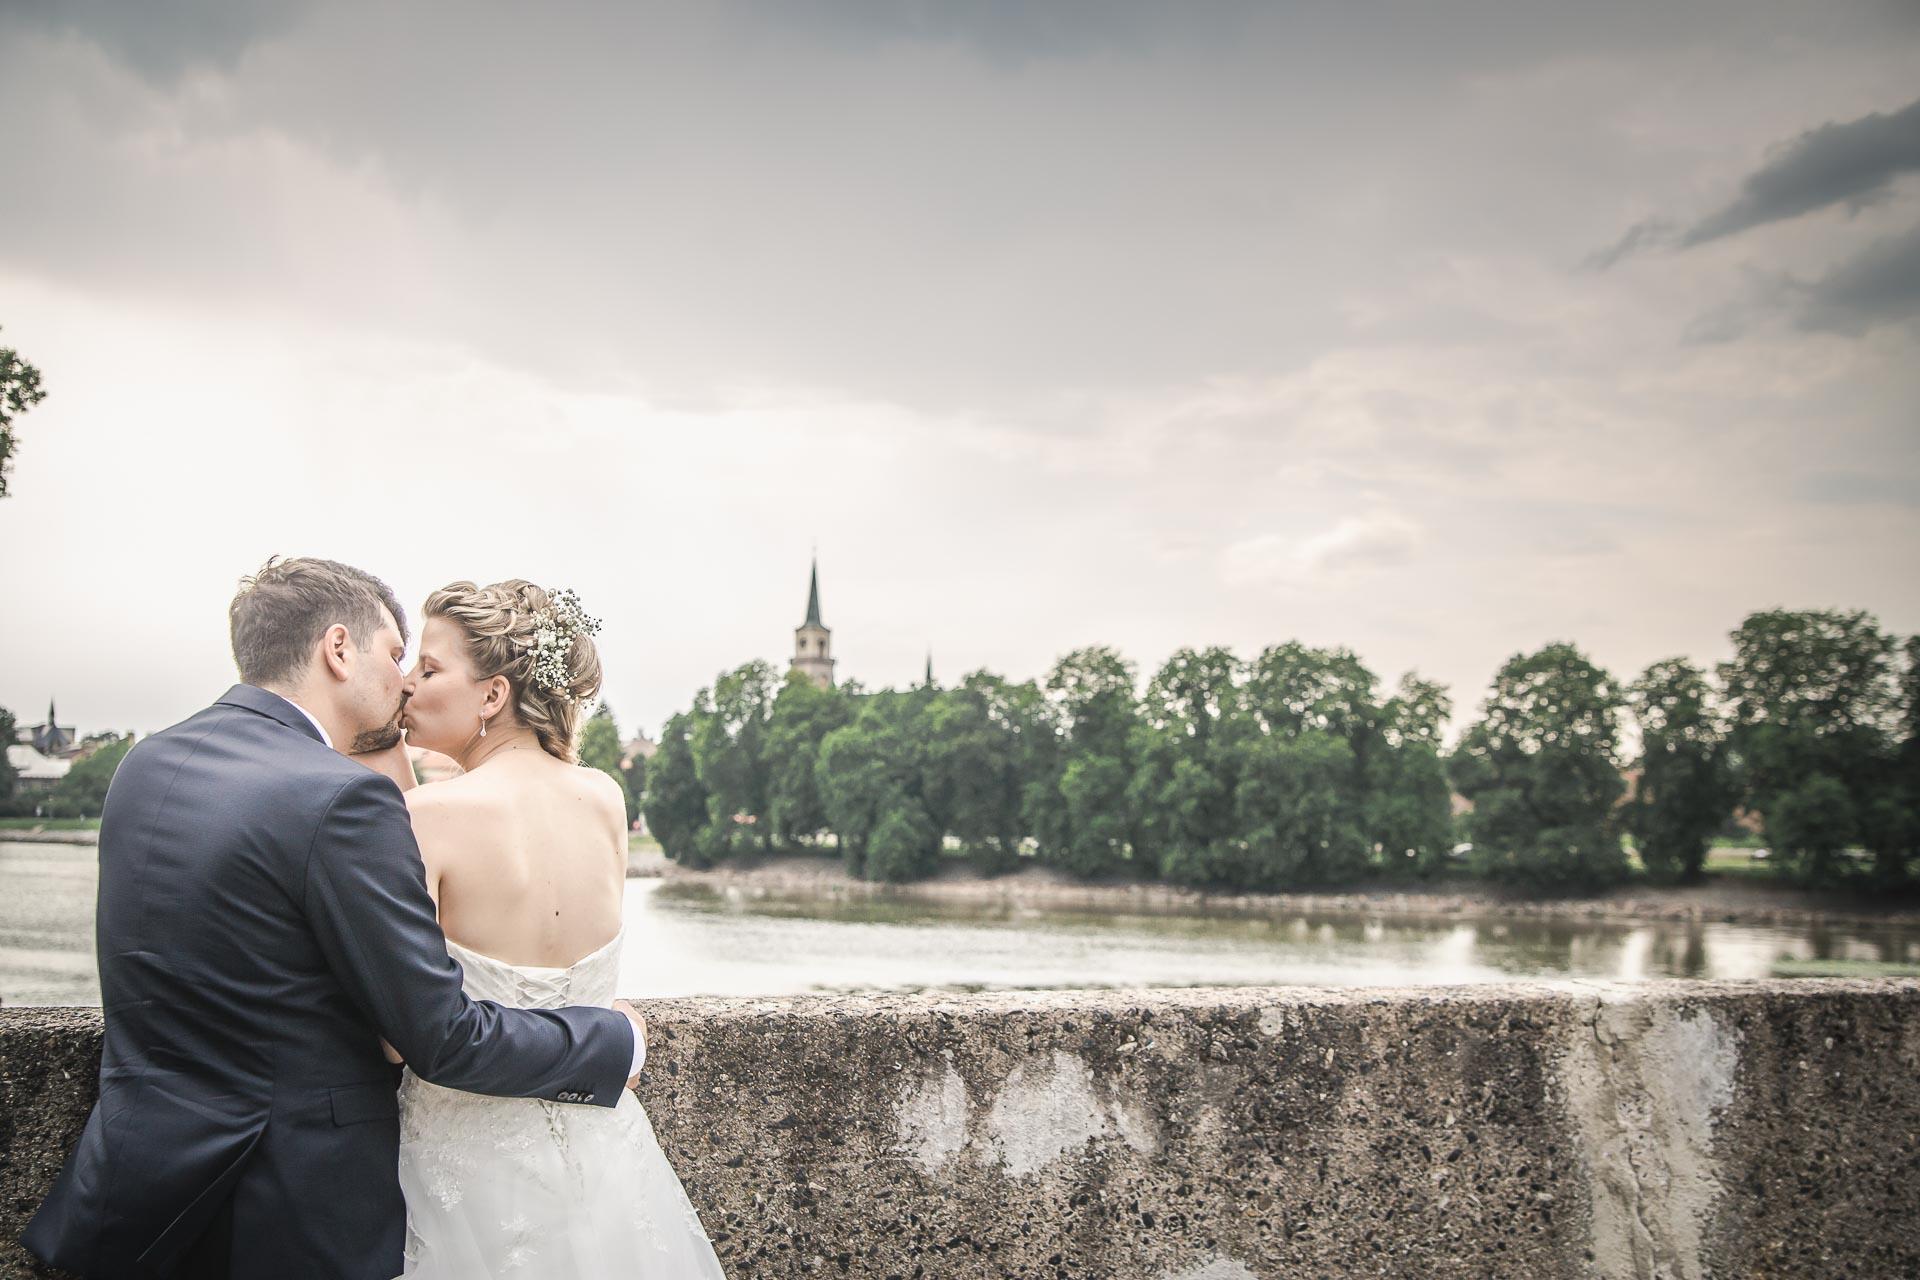 Svatební-fotograf-Nymburk-6132